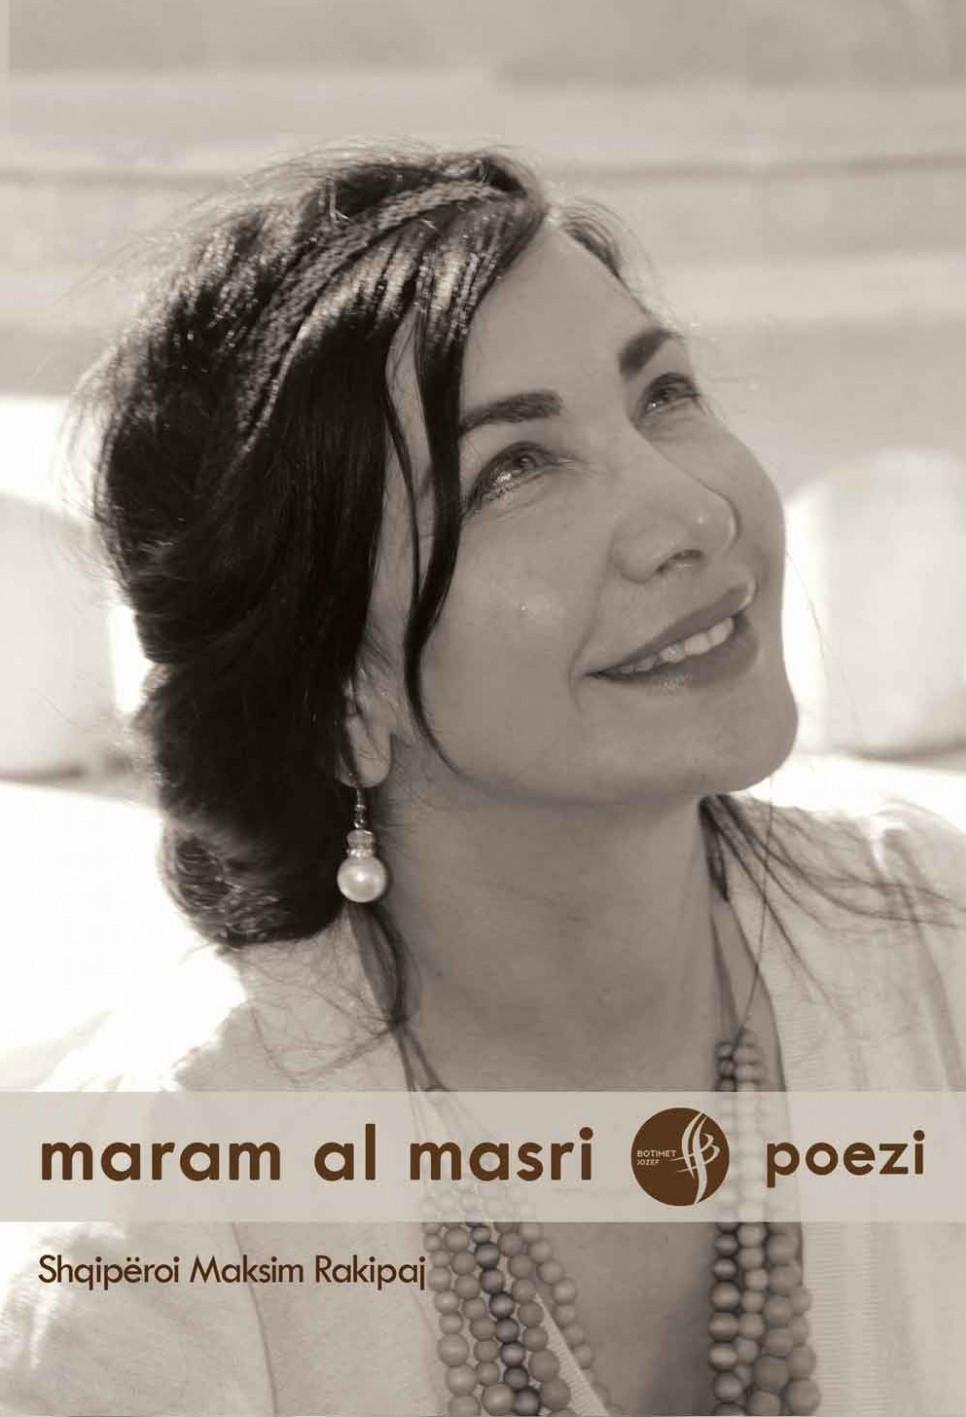 Poezi - Maram al Masri